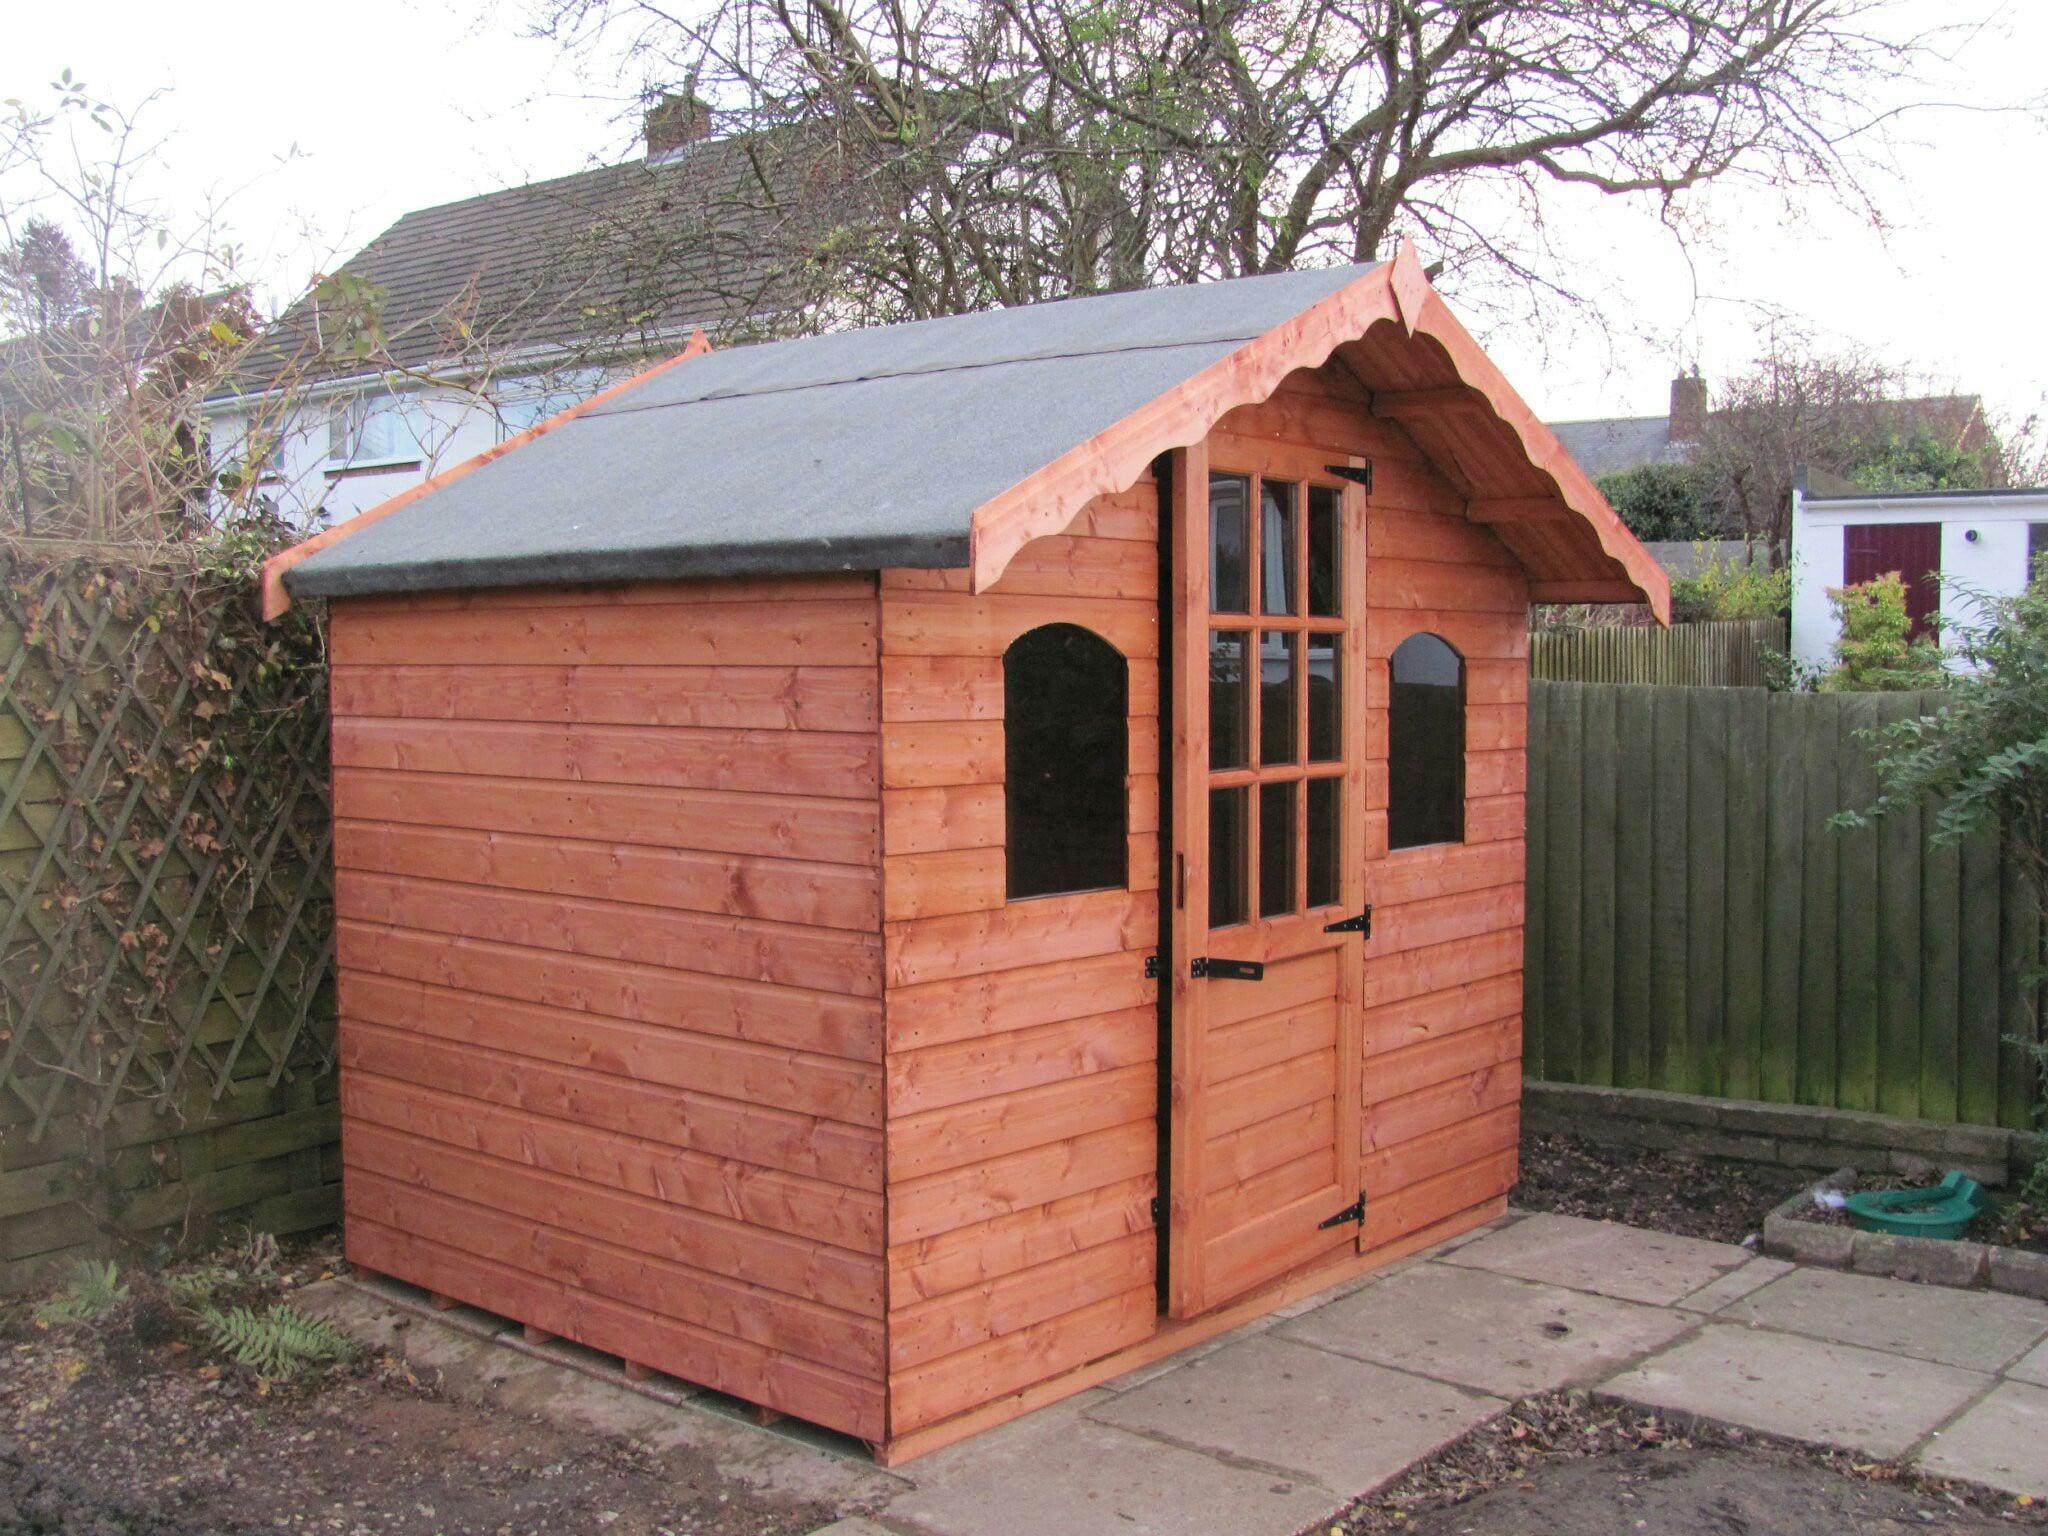 Swiss lodge shed no1 discount shedsno1 discount sheds for Discount shed